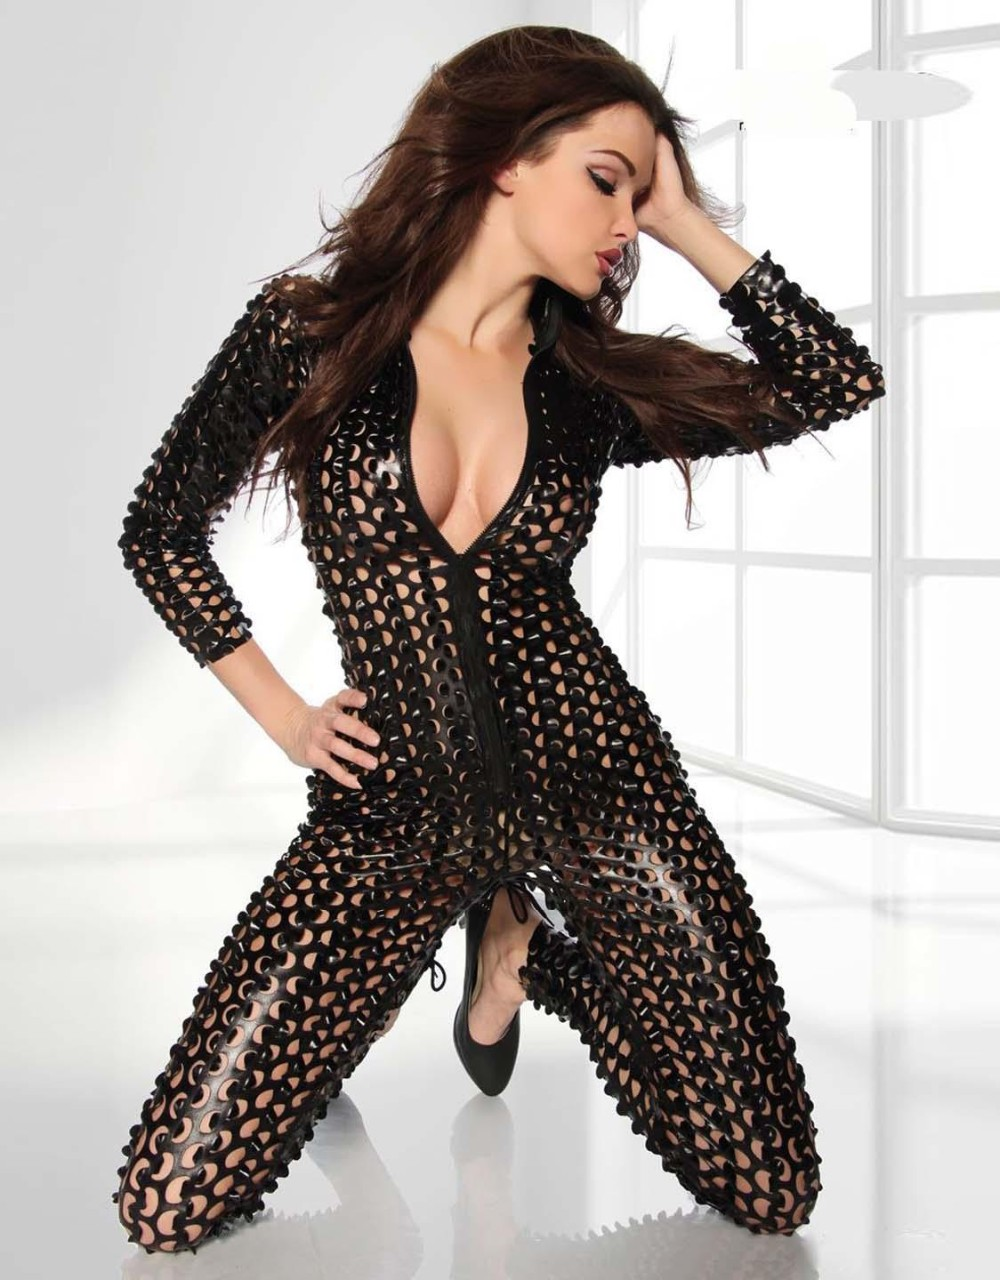 Black-Metallic-Clubwear-Catsuit-with-Cutouts-W7711C-3(1)